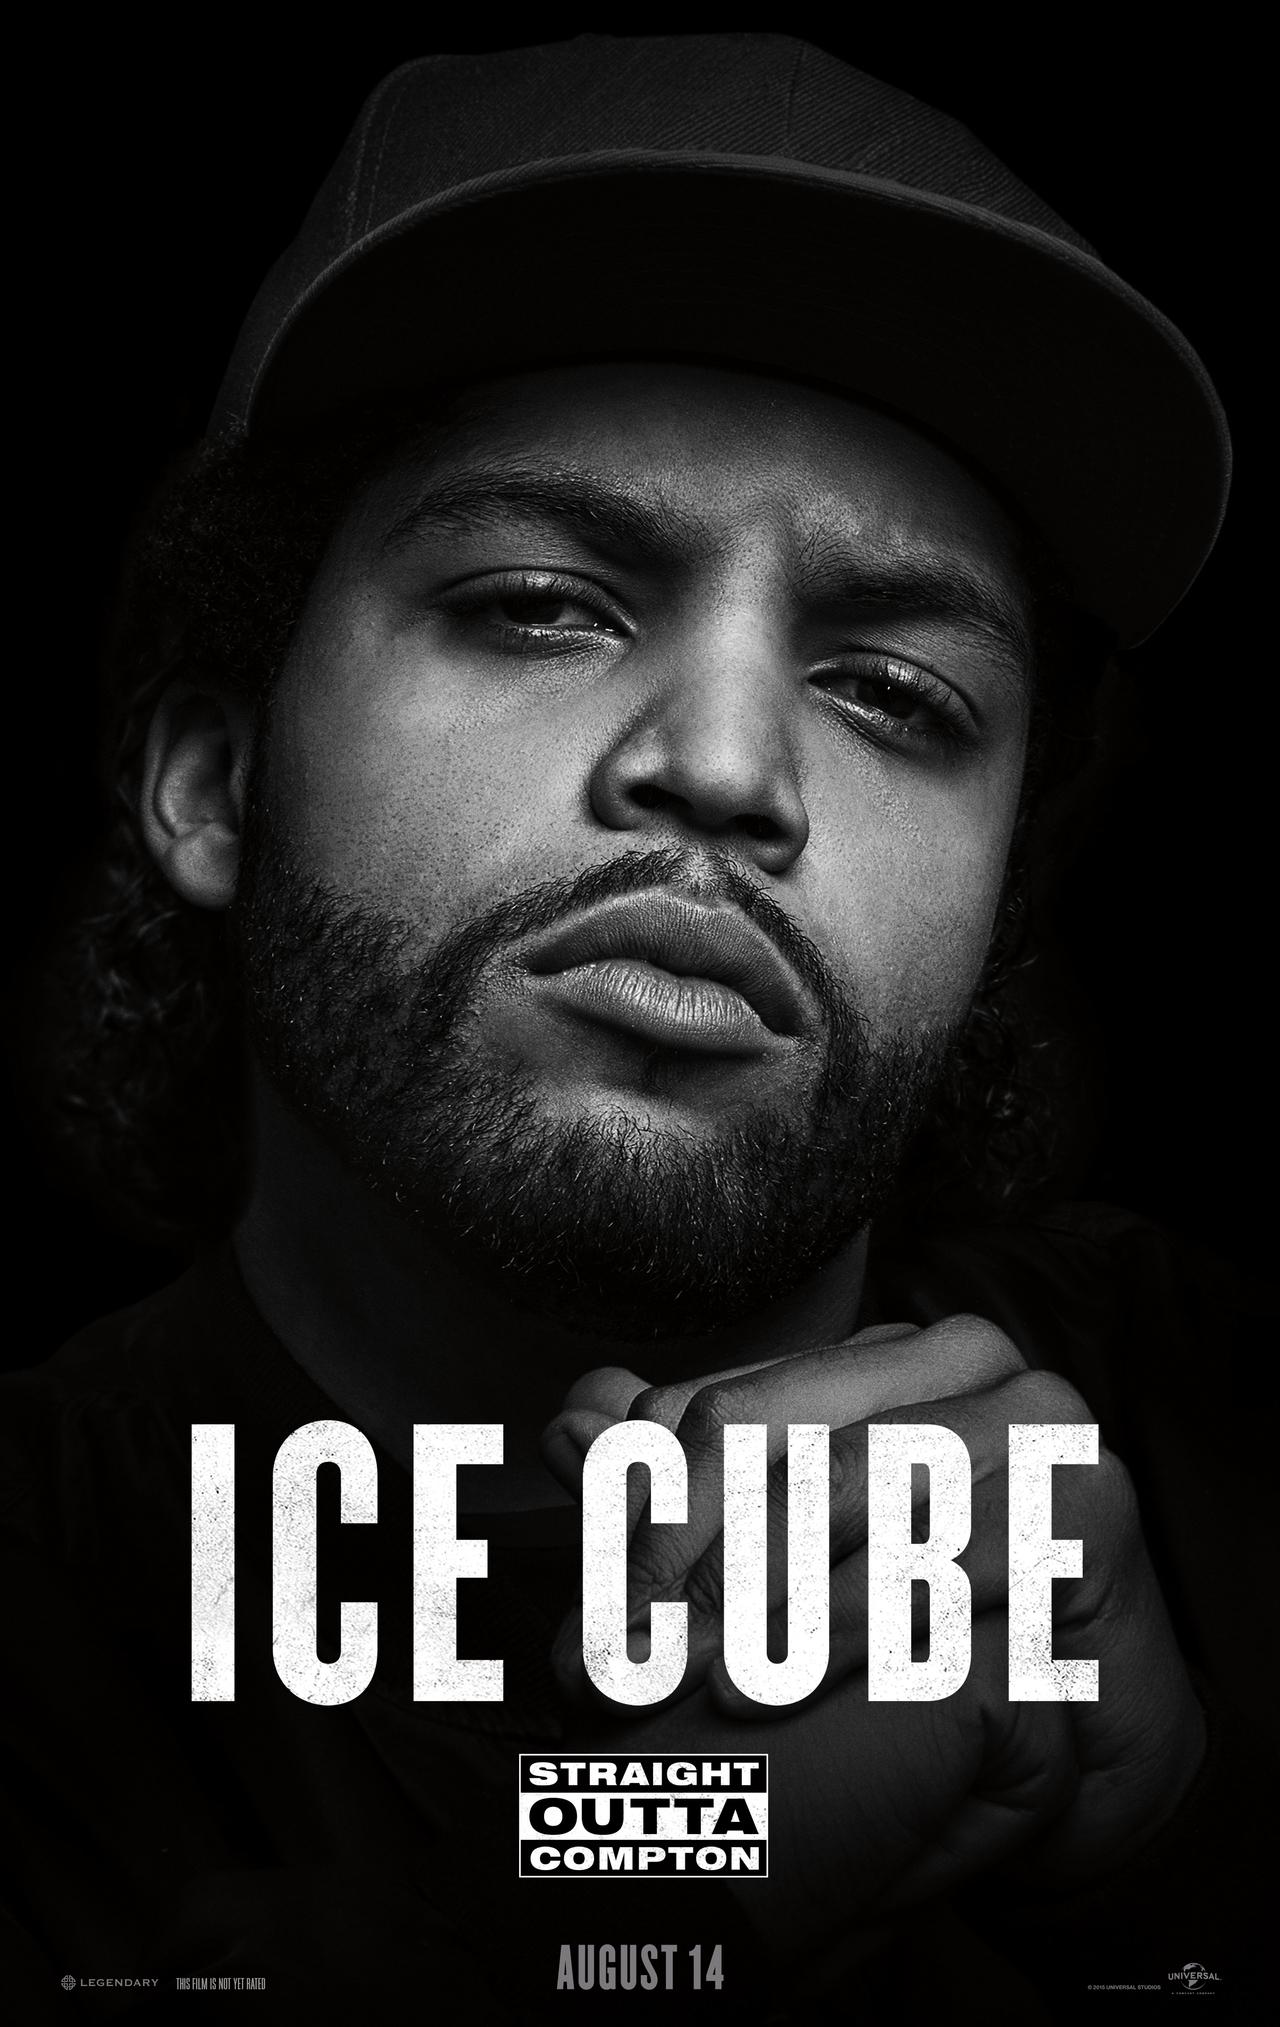 O'Shea Jackson, Jr. as Ice Cube